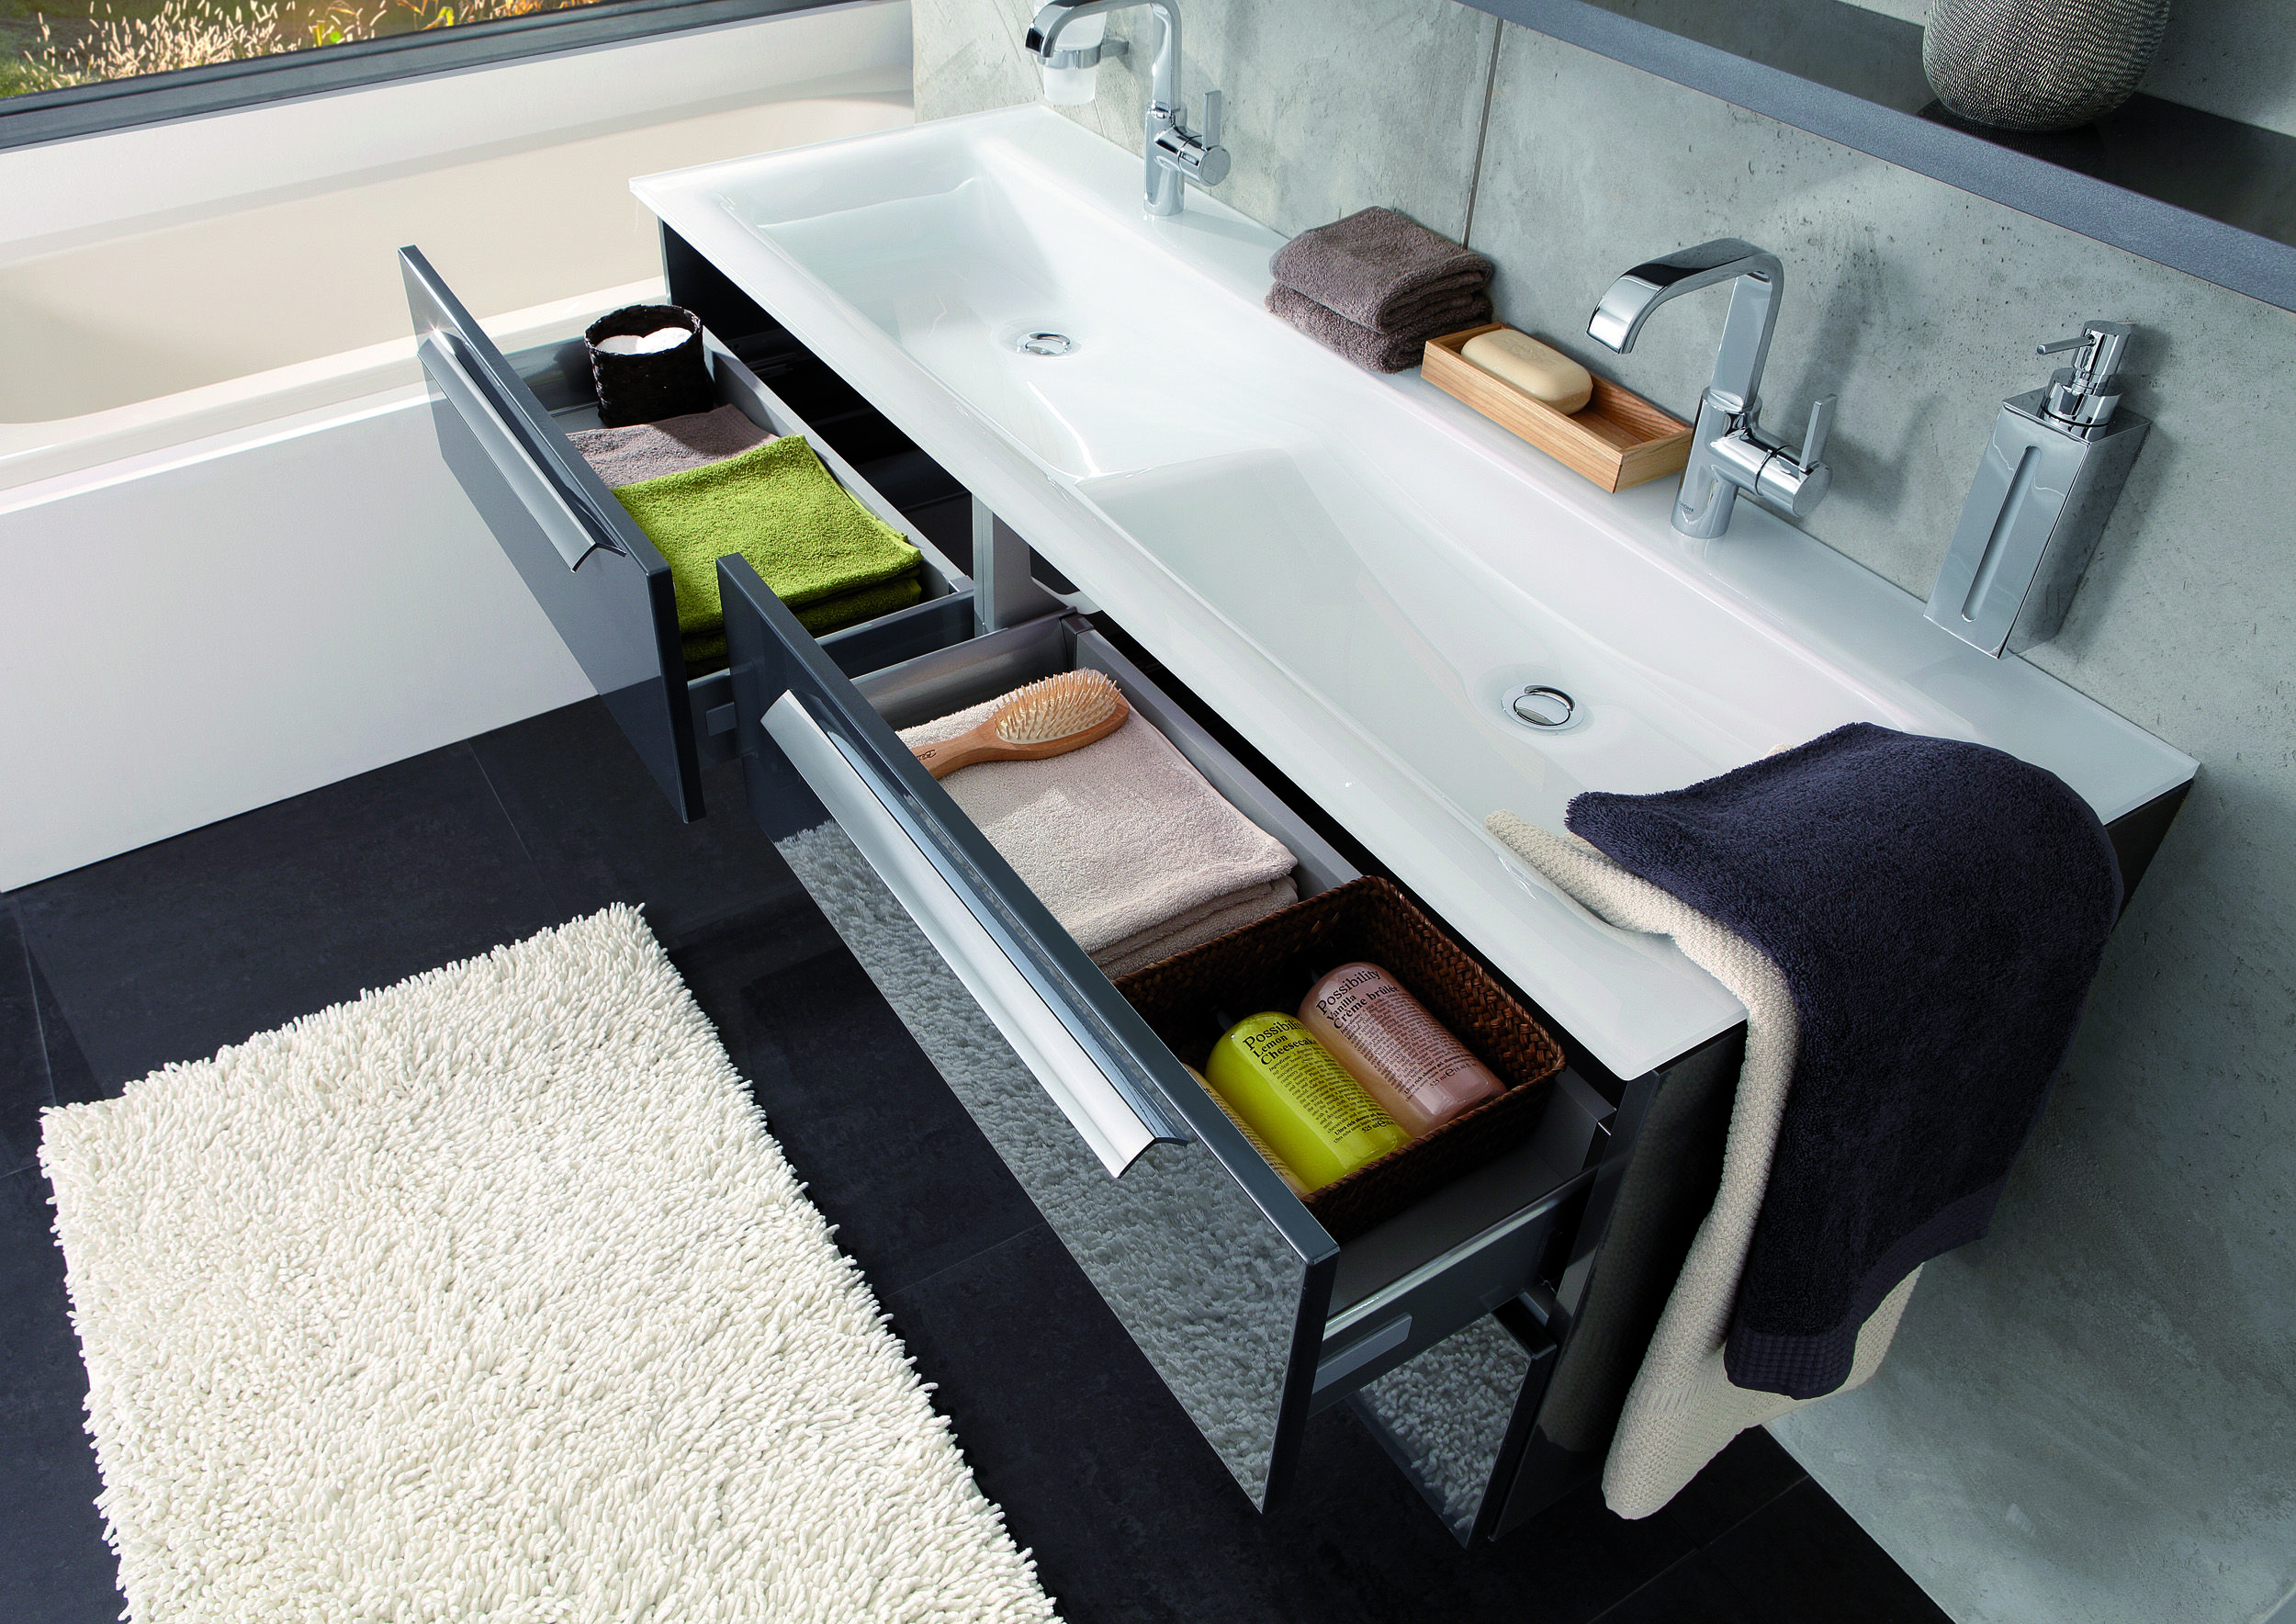 Badkamermeubel Met Sanitair : Badkamermeubel i indeling i dubbel wastafel i badkamer i sanitair